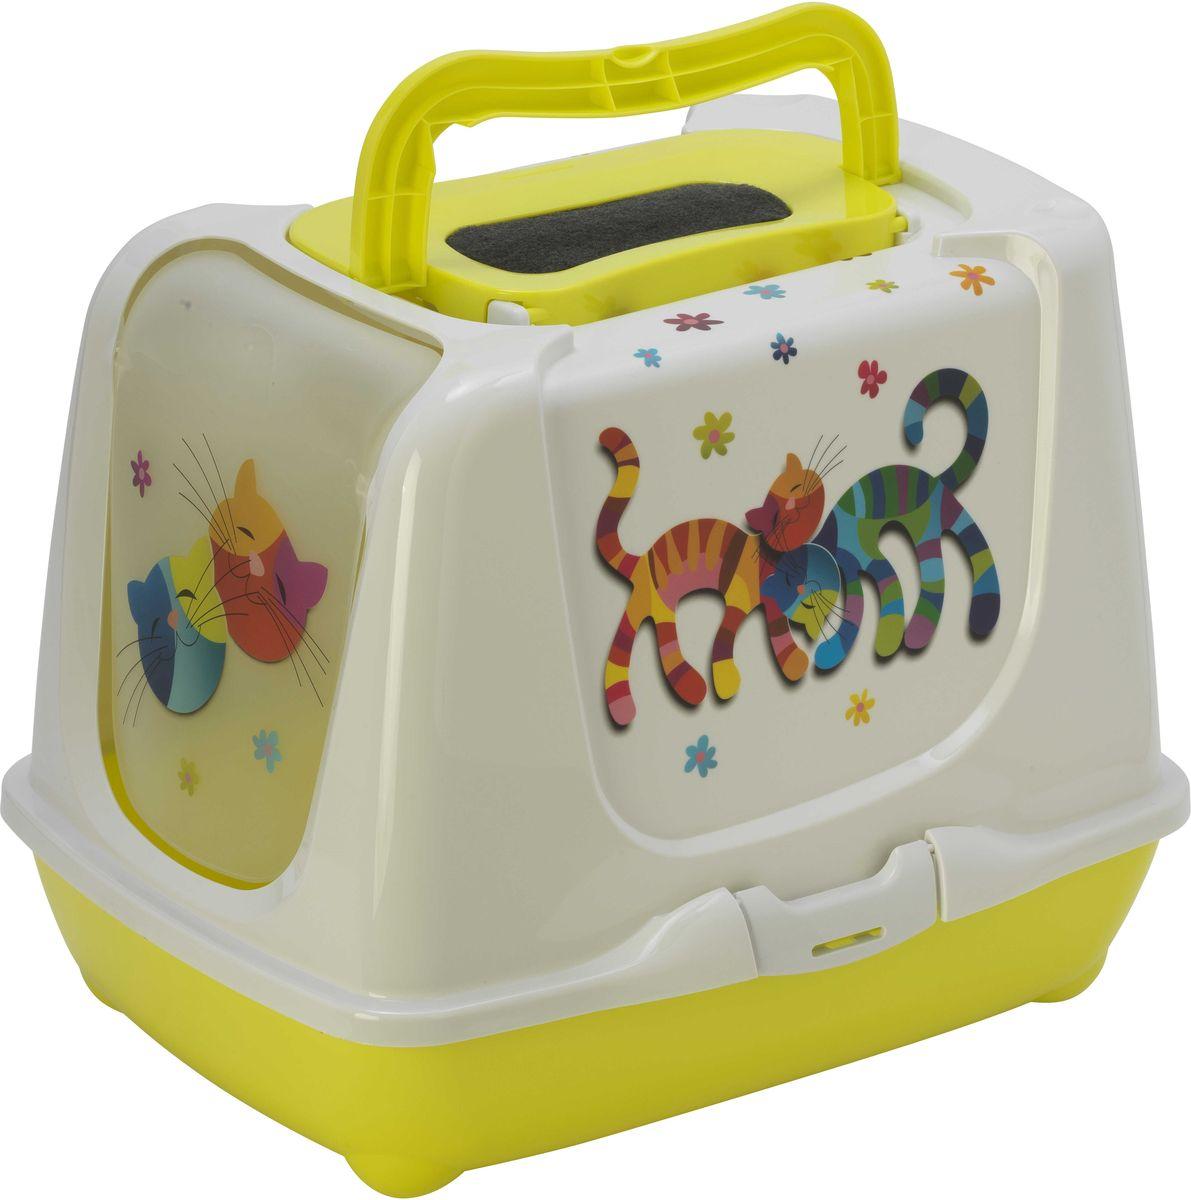 Туалет закрытый для кошек Moderna Trendy Cat. Друзья Навсегда, цвет: лимон, 50 х 39,5 х 37,5 см14C235329